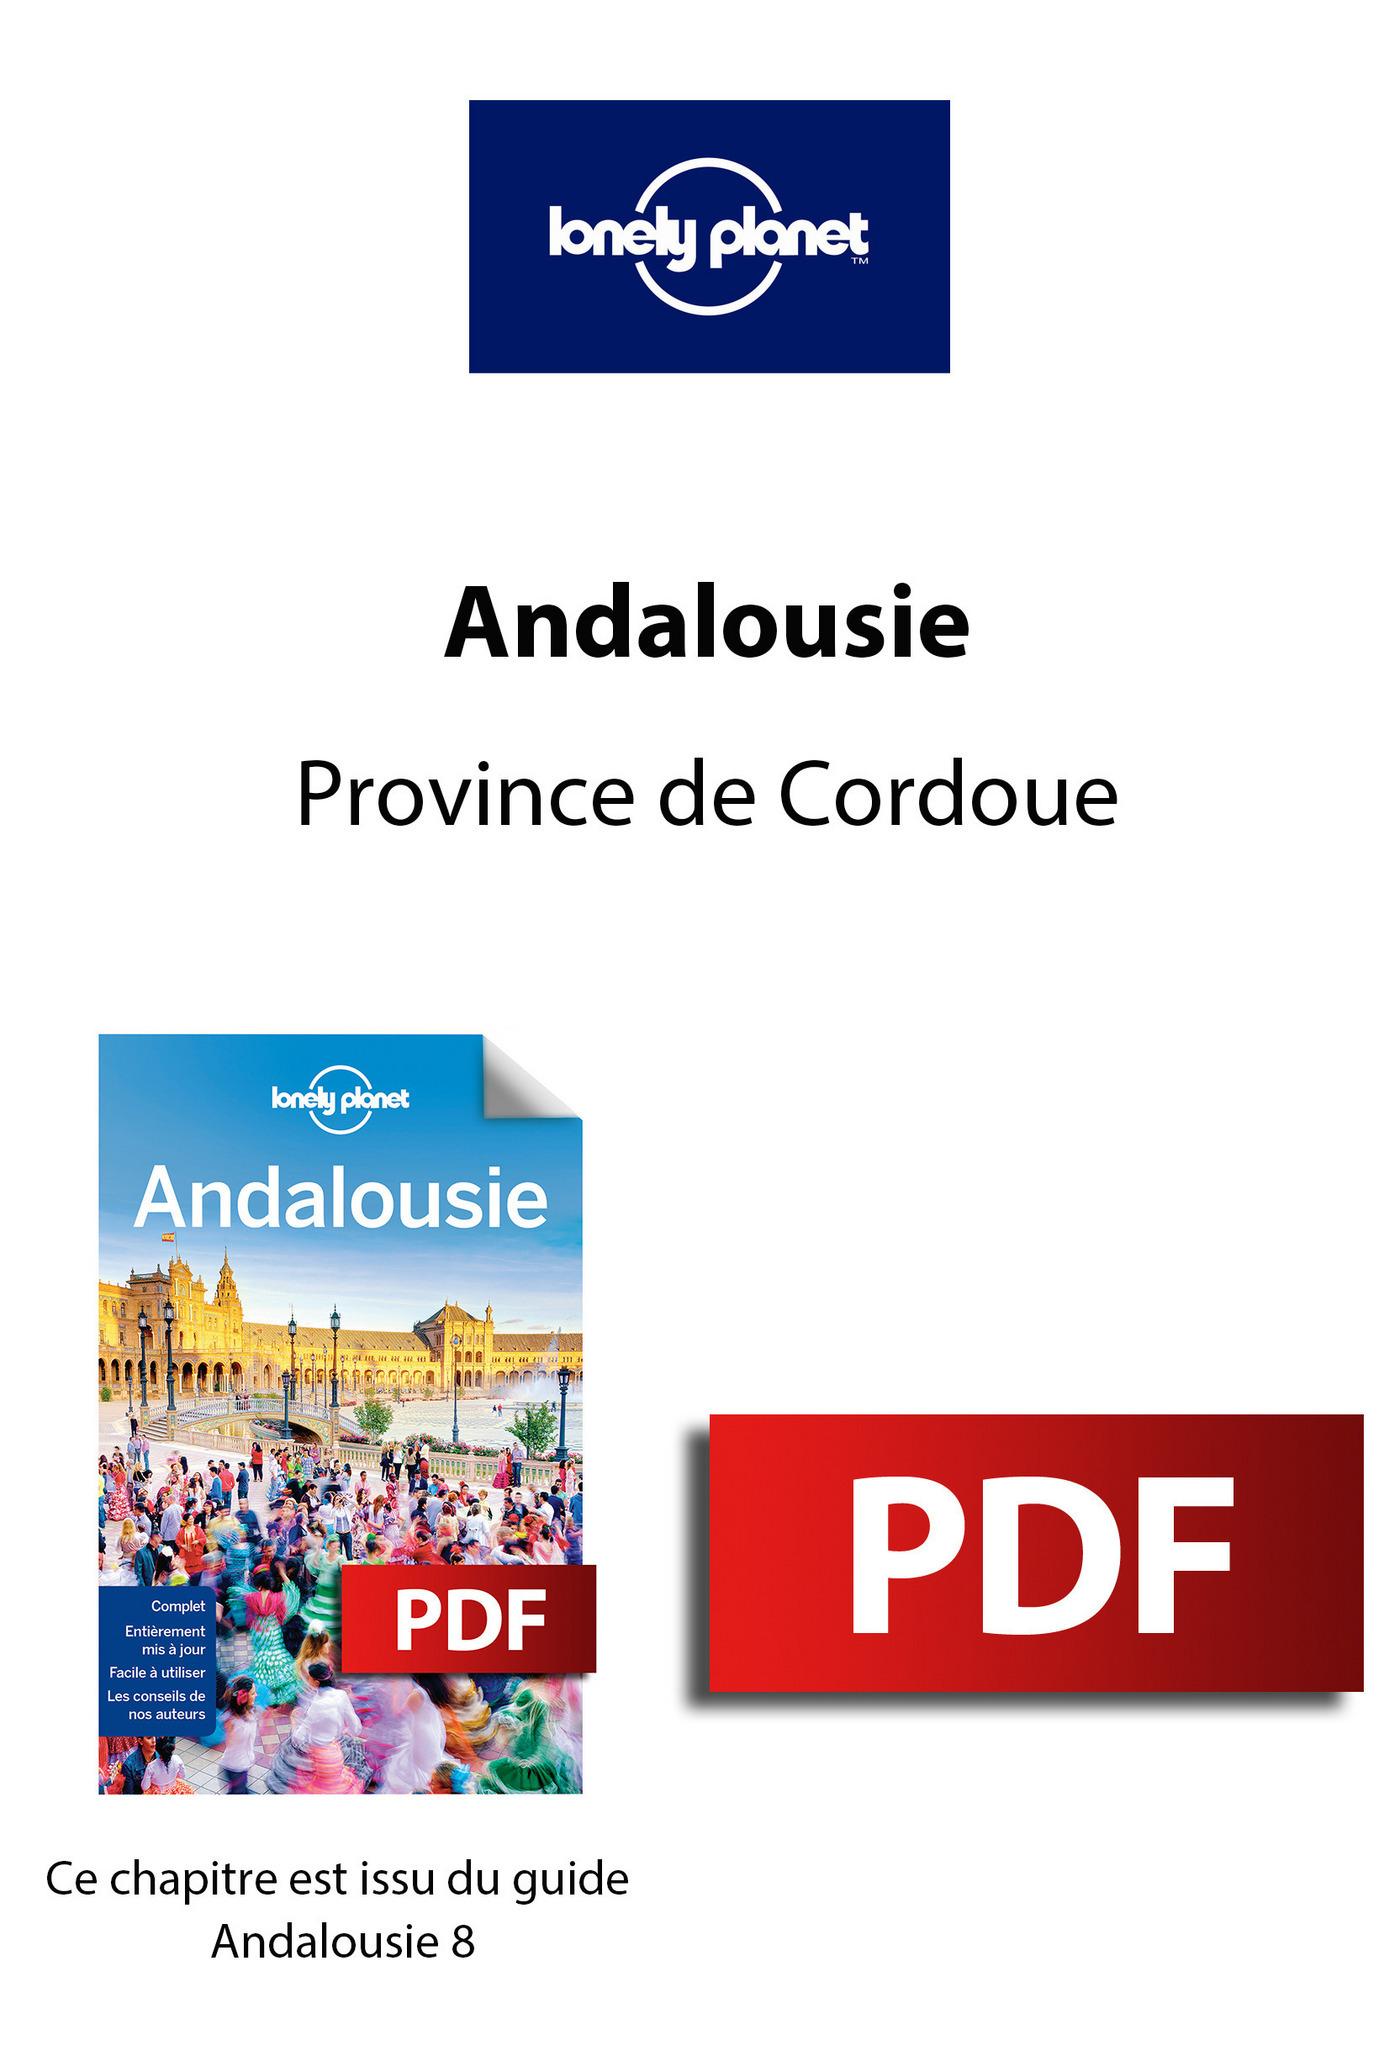 Andalousie - Province de Cordoue